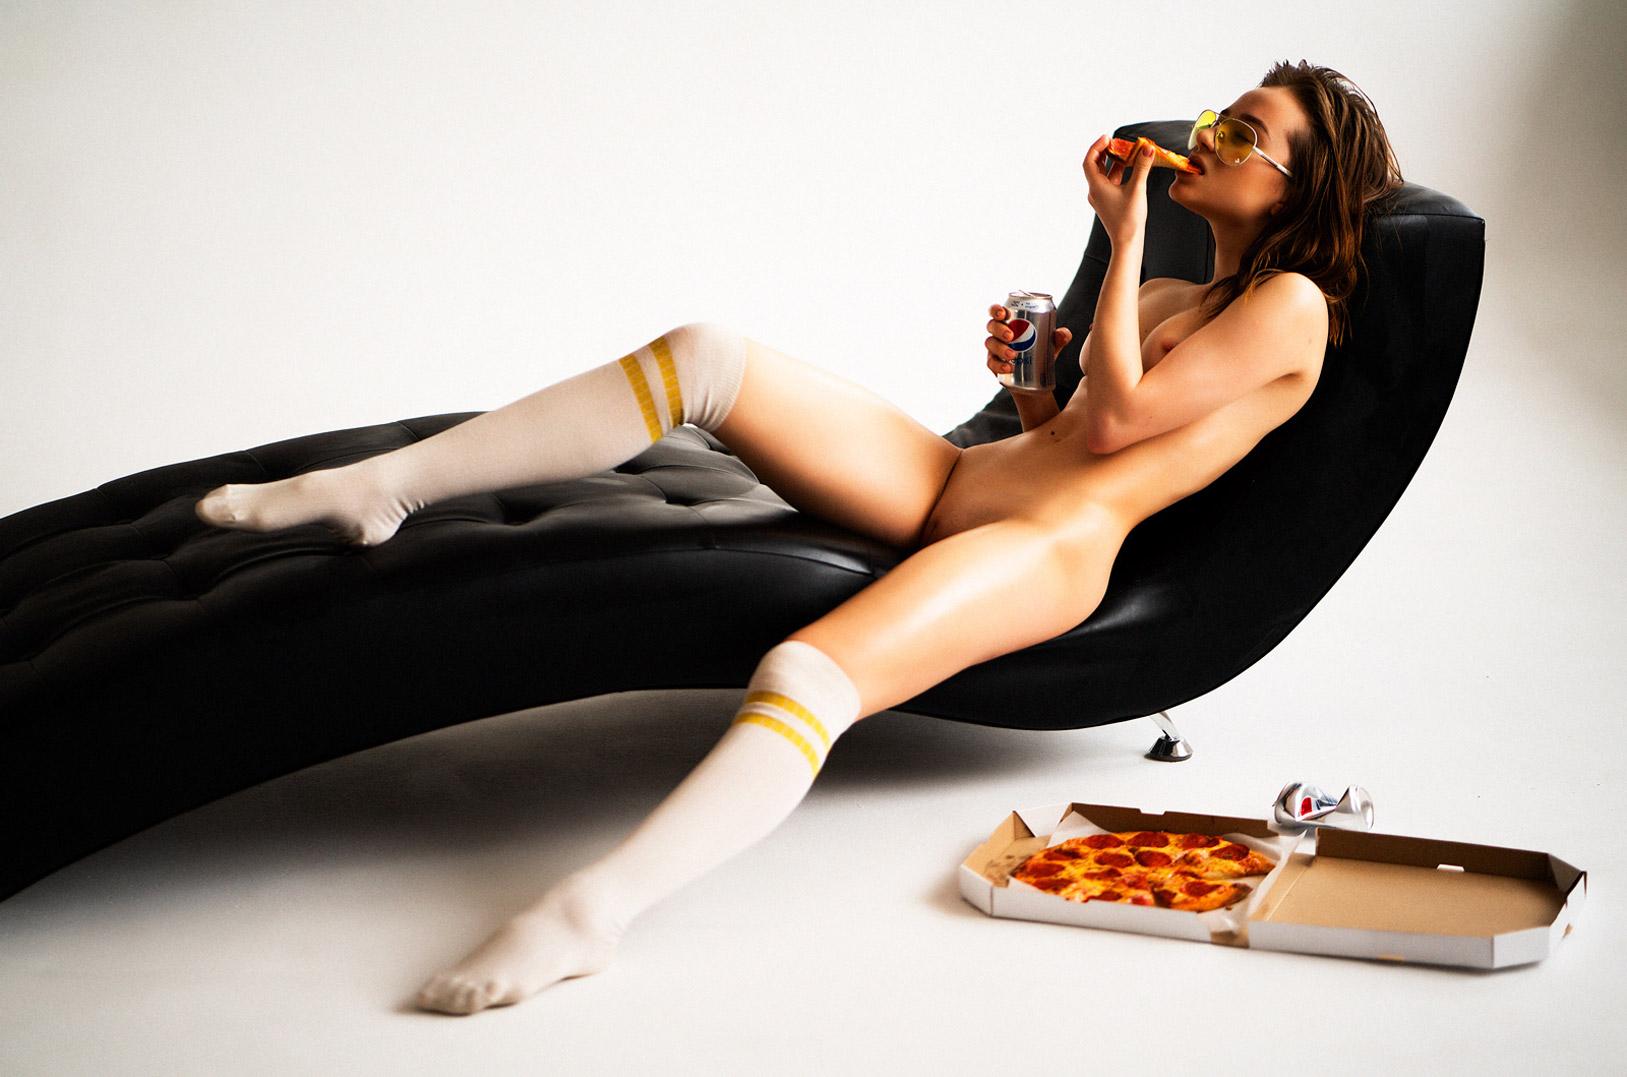 Pizza / Katherine nude by Vladislav Spivak